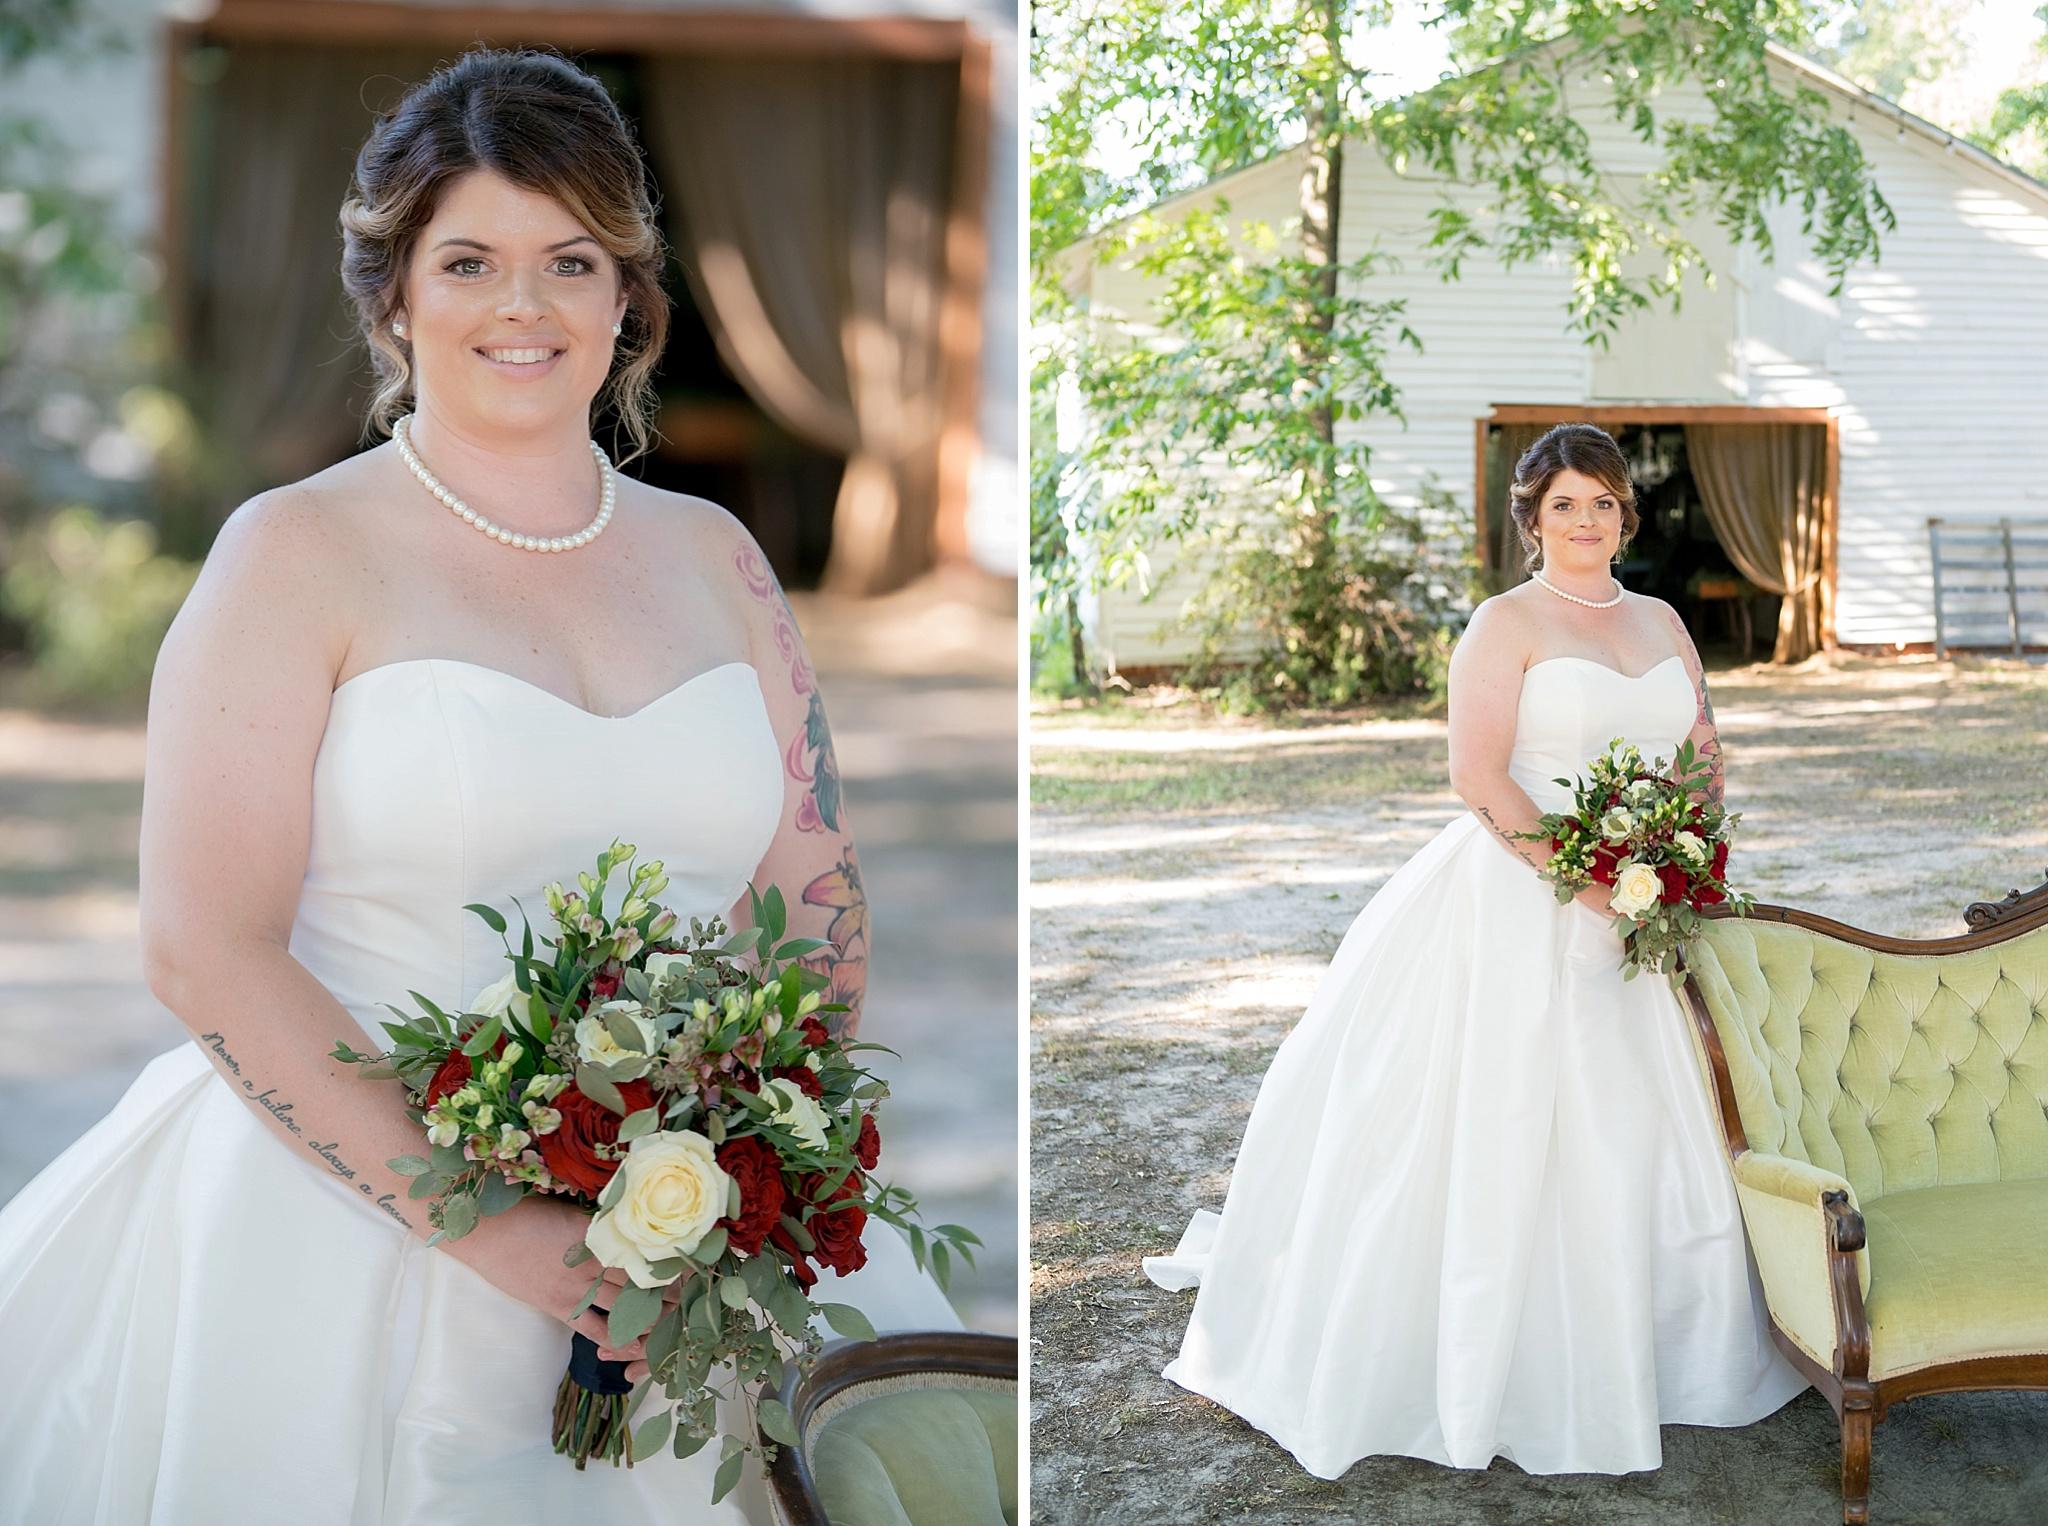 Longstraw-Farms-Wedding-Photographer-044.jpg